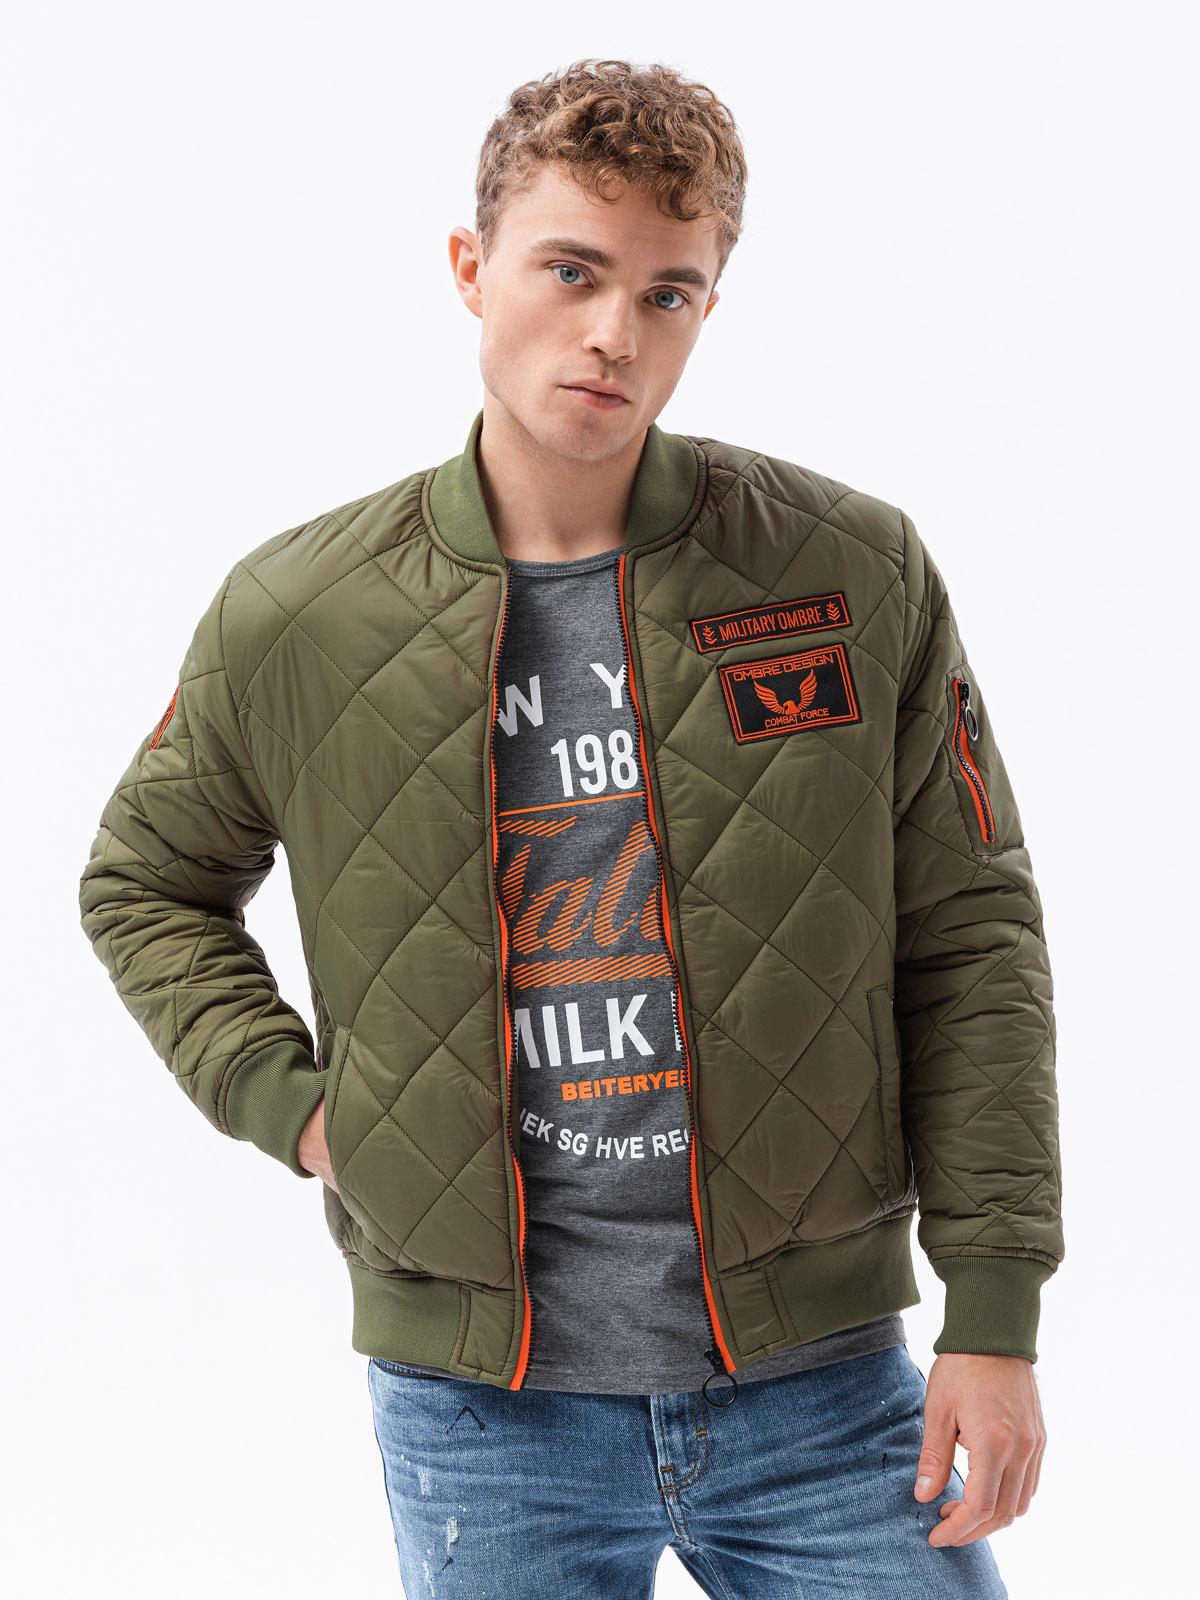 Men's mid season bomber jacket C357 olive | MODONE